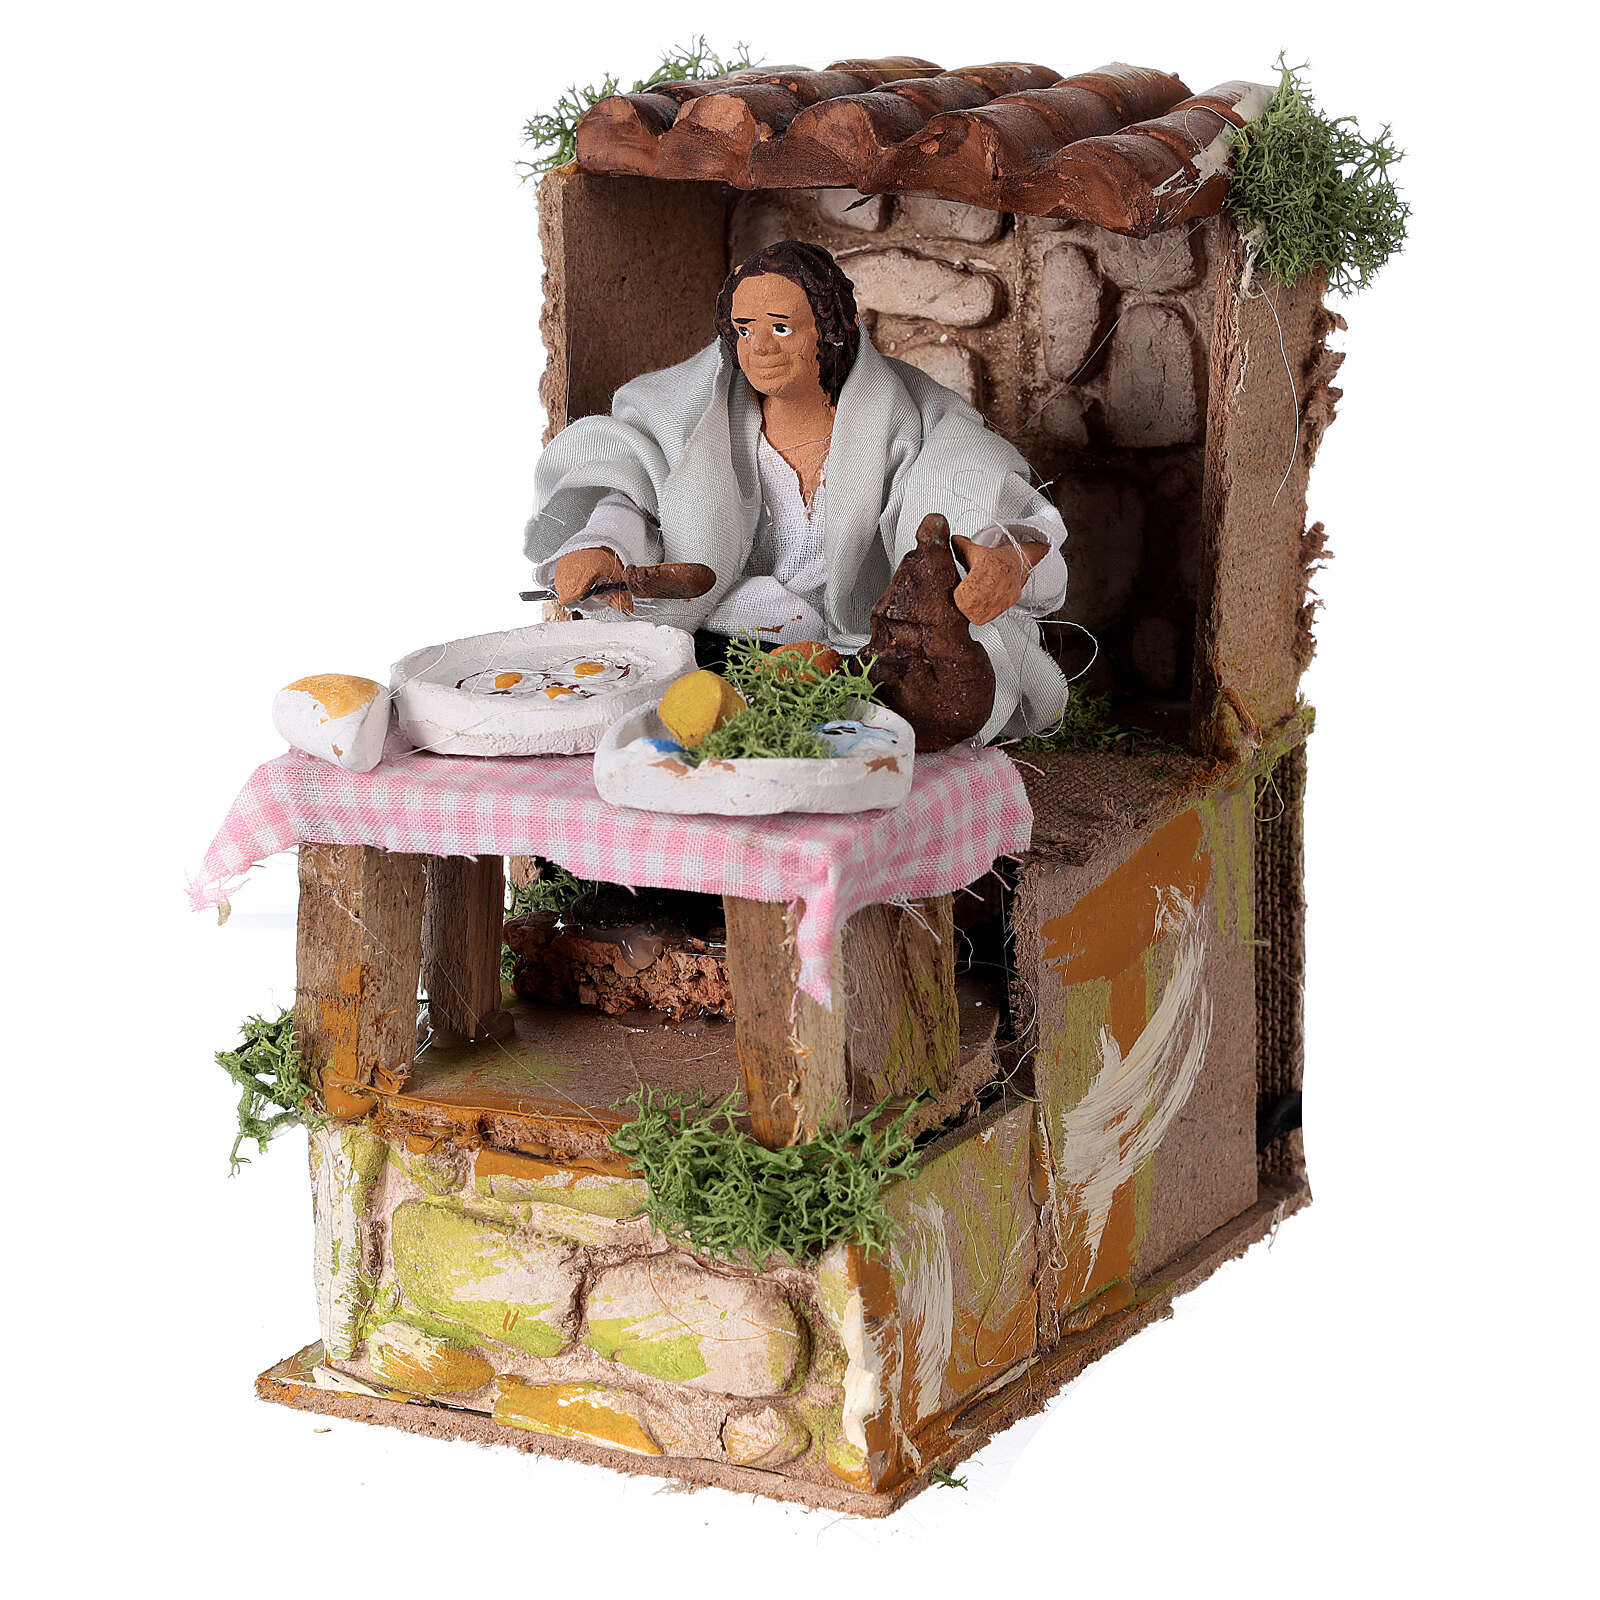 Man cooking, animated nativity figure 10 cm 3